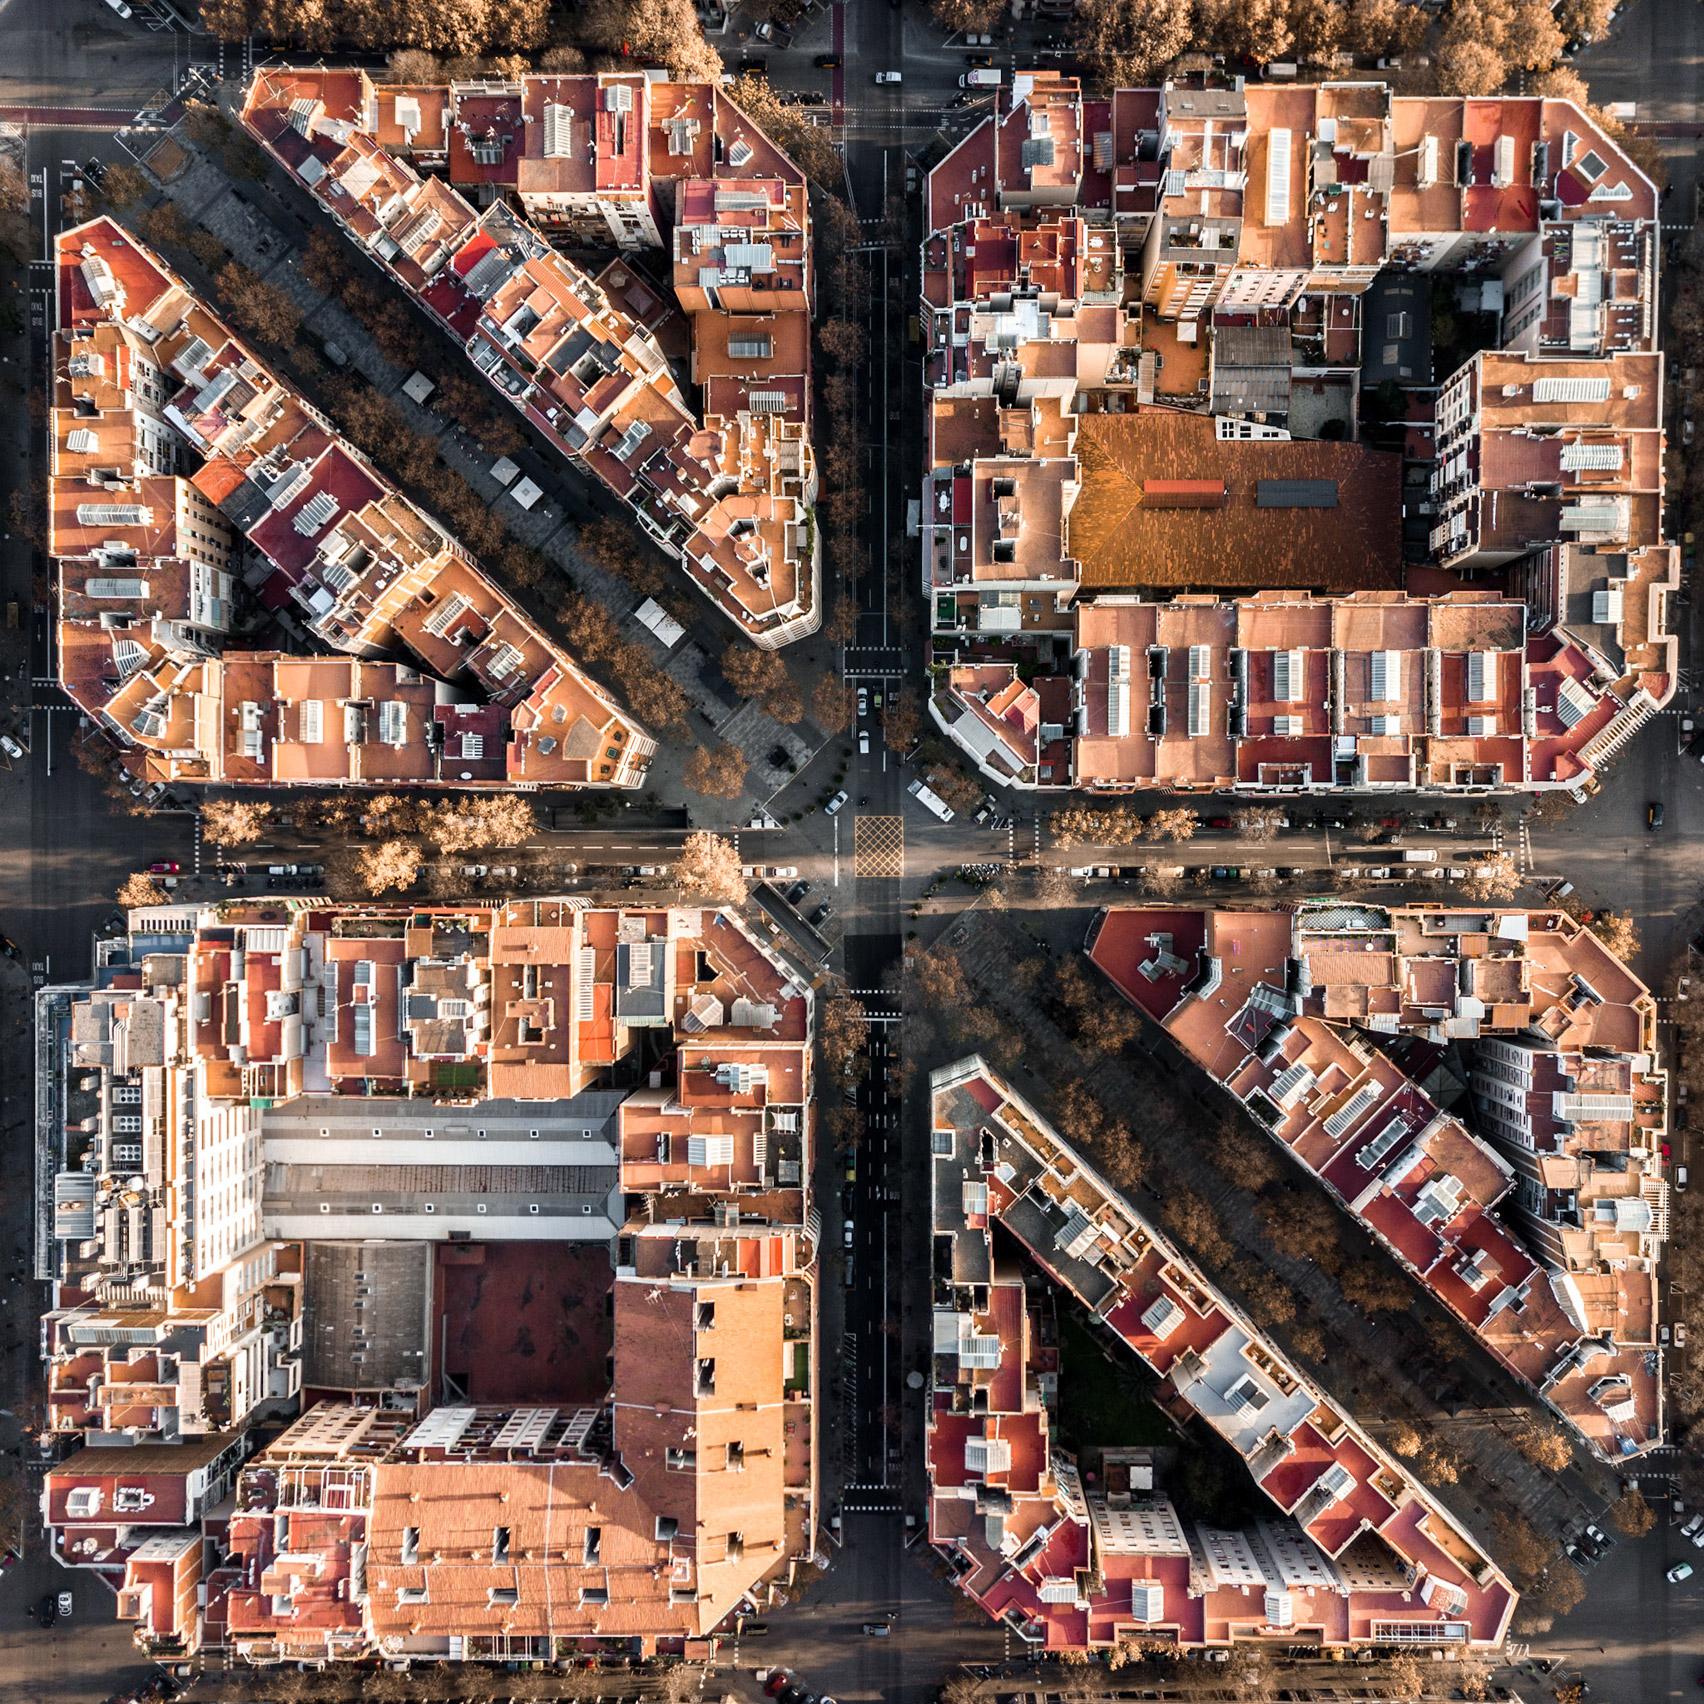 loat-anh-tai-hien-mot-barcelona-trat-tu-va-doi-xung-kien-viet-2.jpg